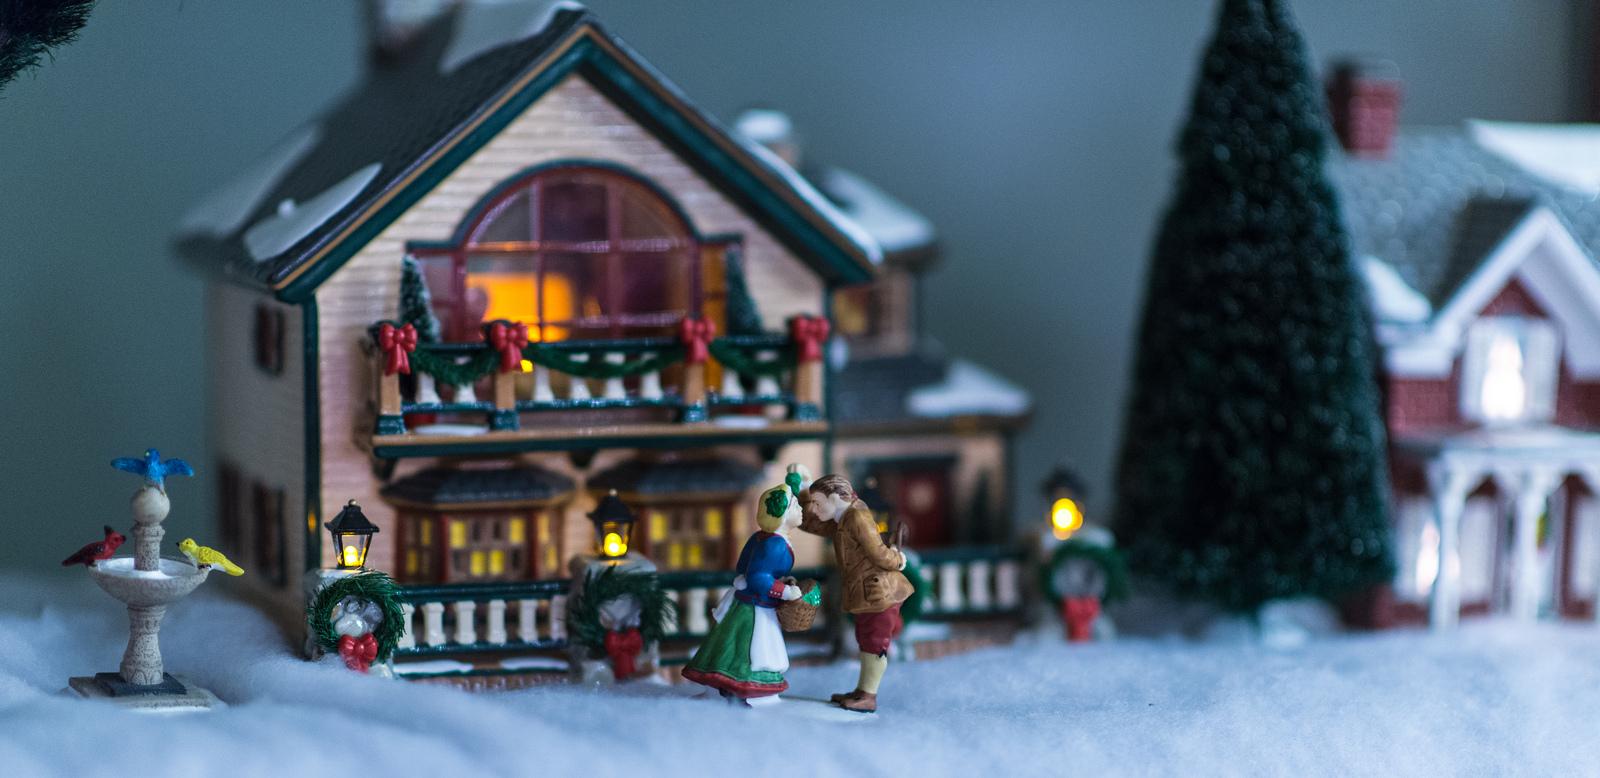 Kissing under the mistletoe at Christmas